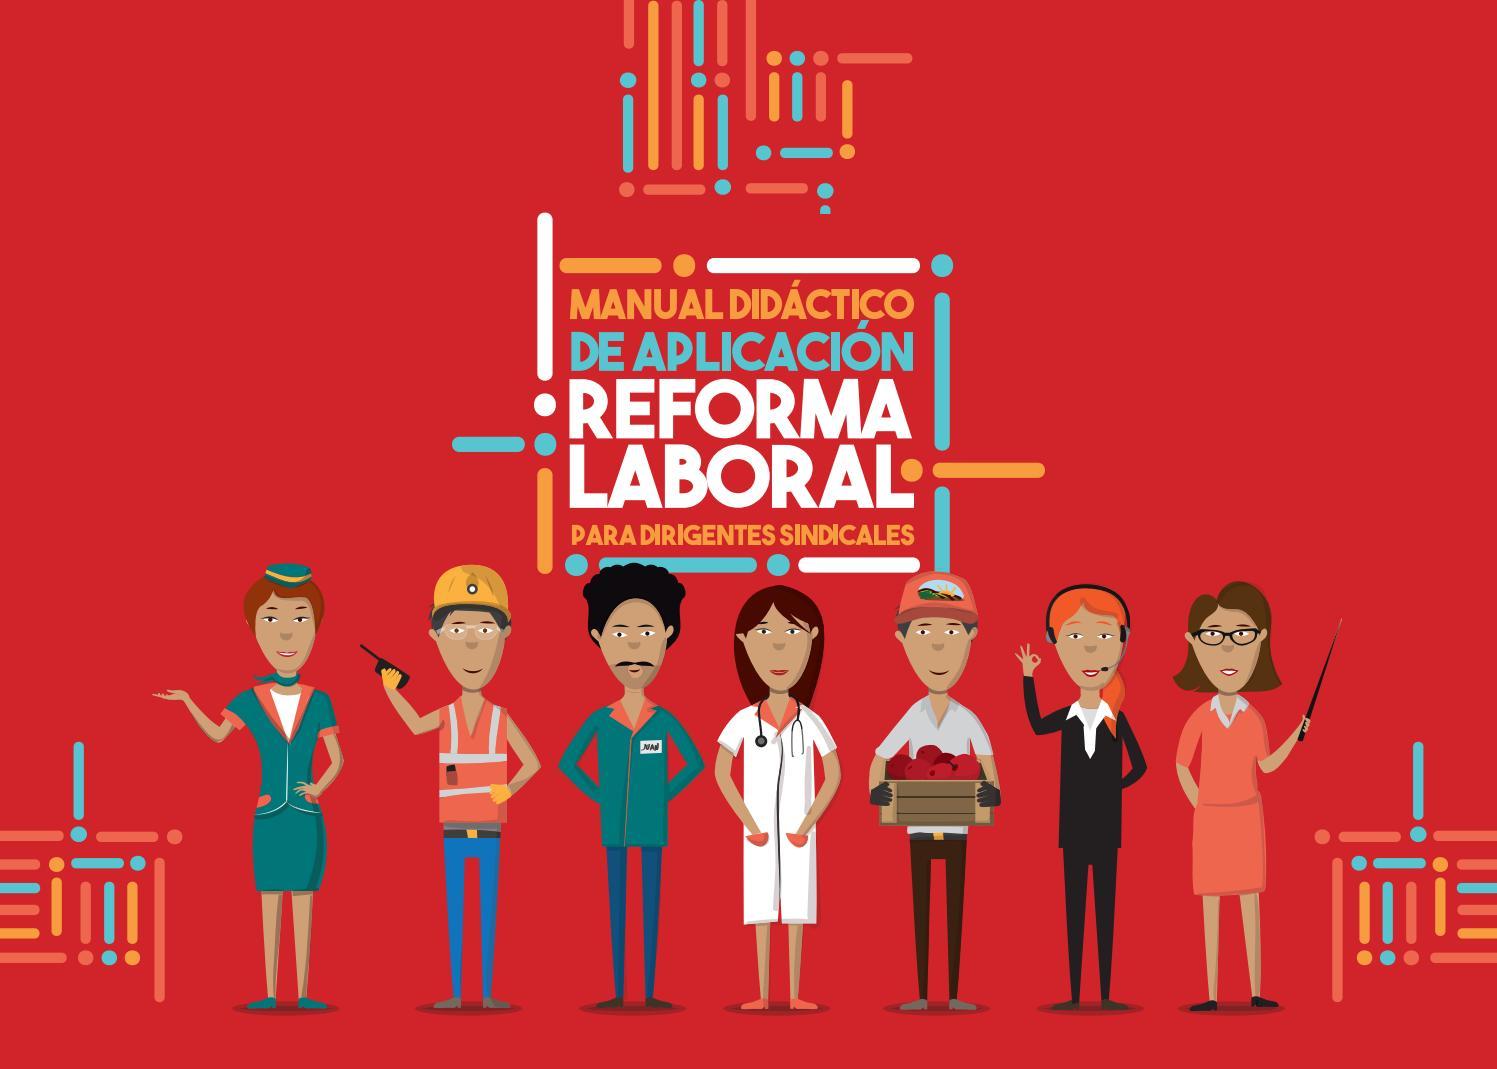 Manual reforma laboral 2017 by PROFESIONALES DEL COBRE - issuu